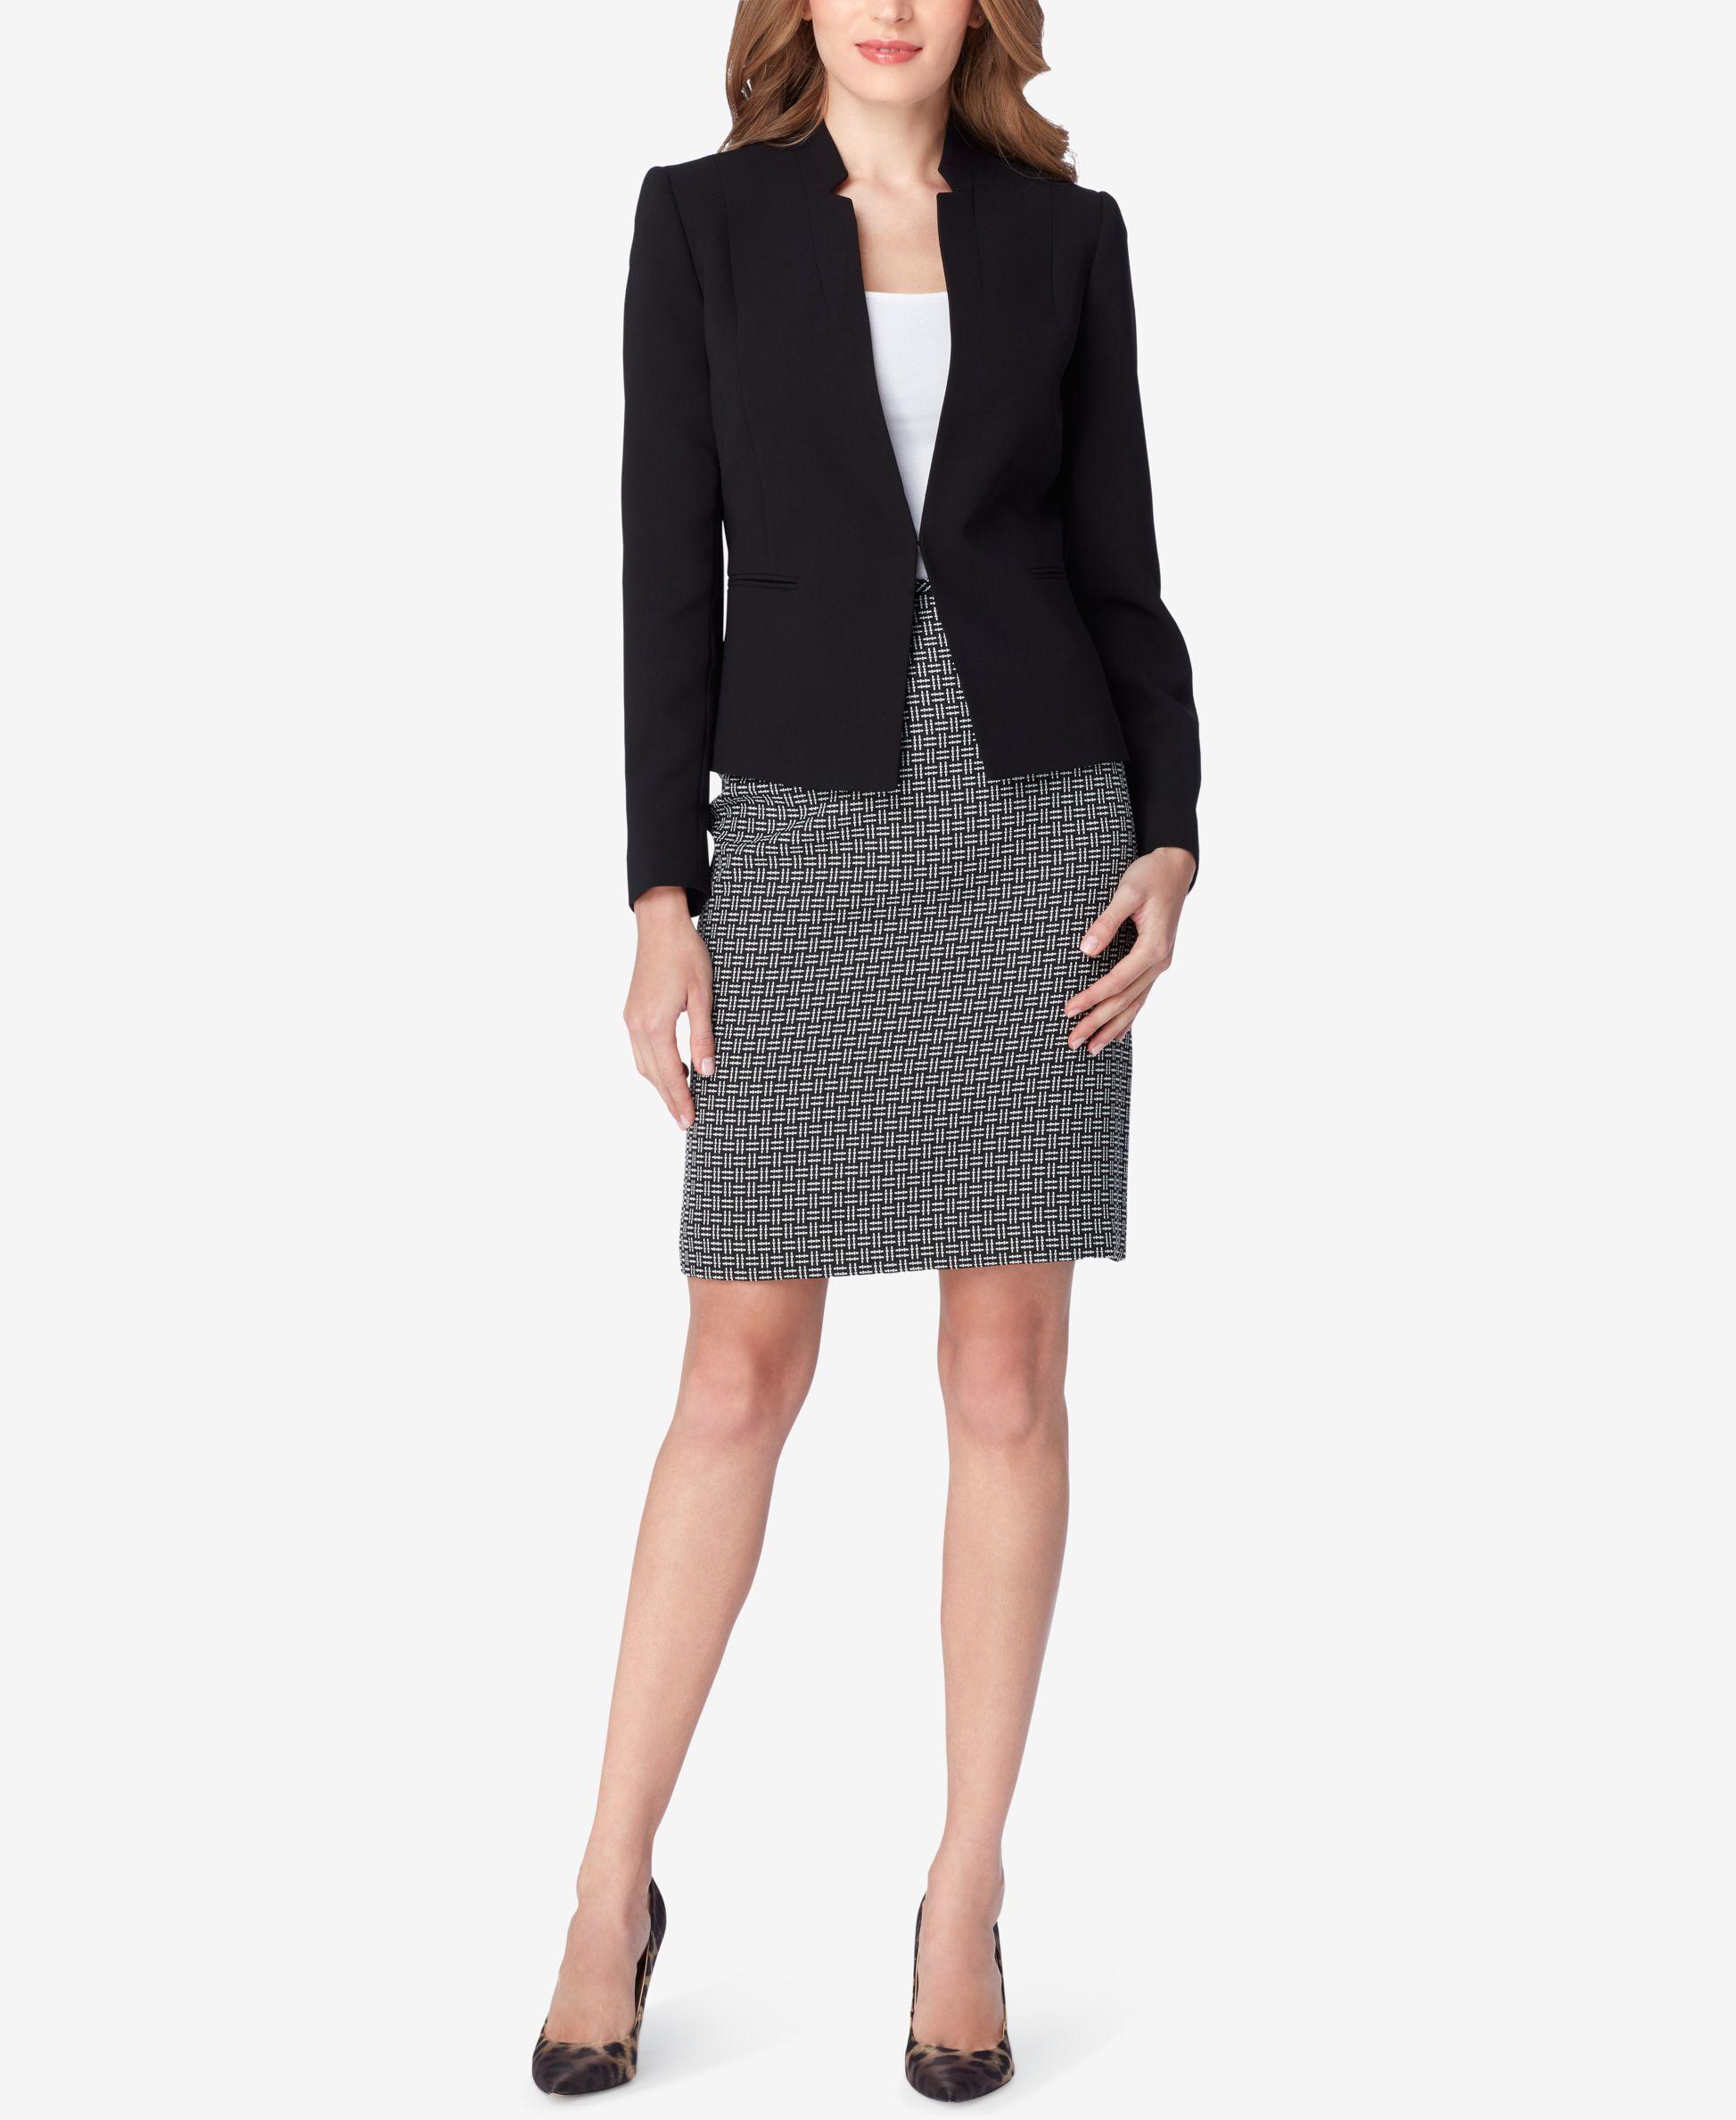 bc1811edf2 Tahari Asl Colorblocked Printed Skirt Suit | Products | Printed ...